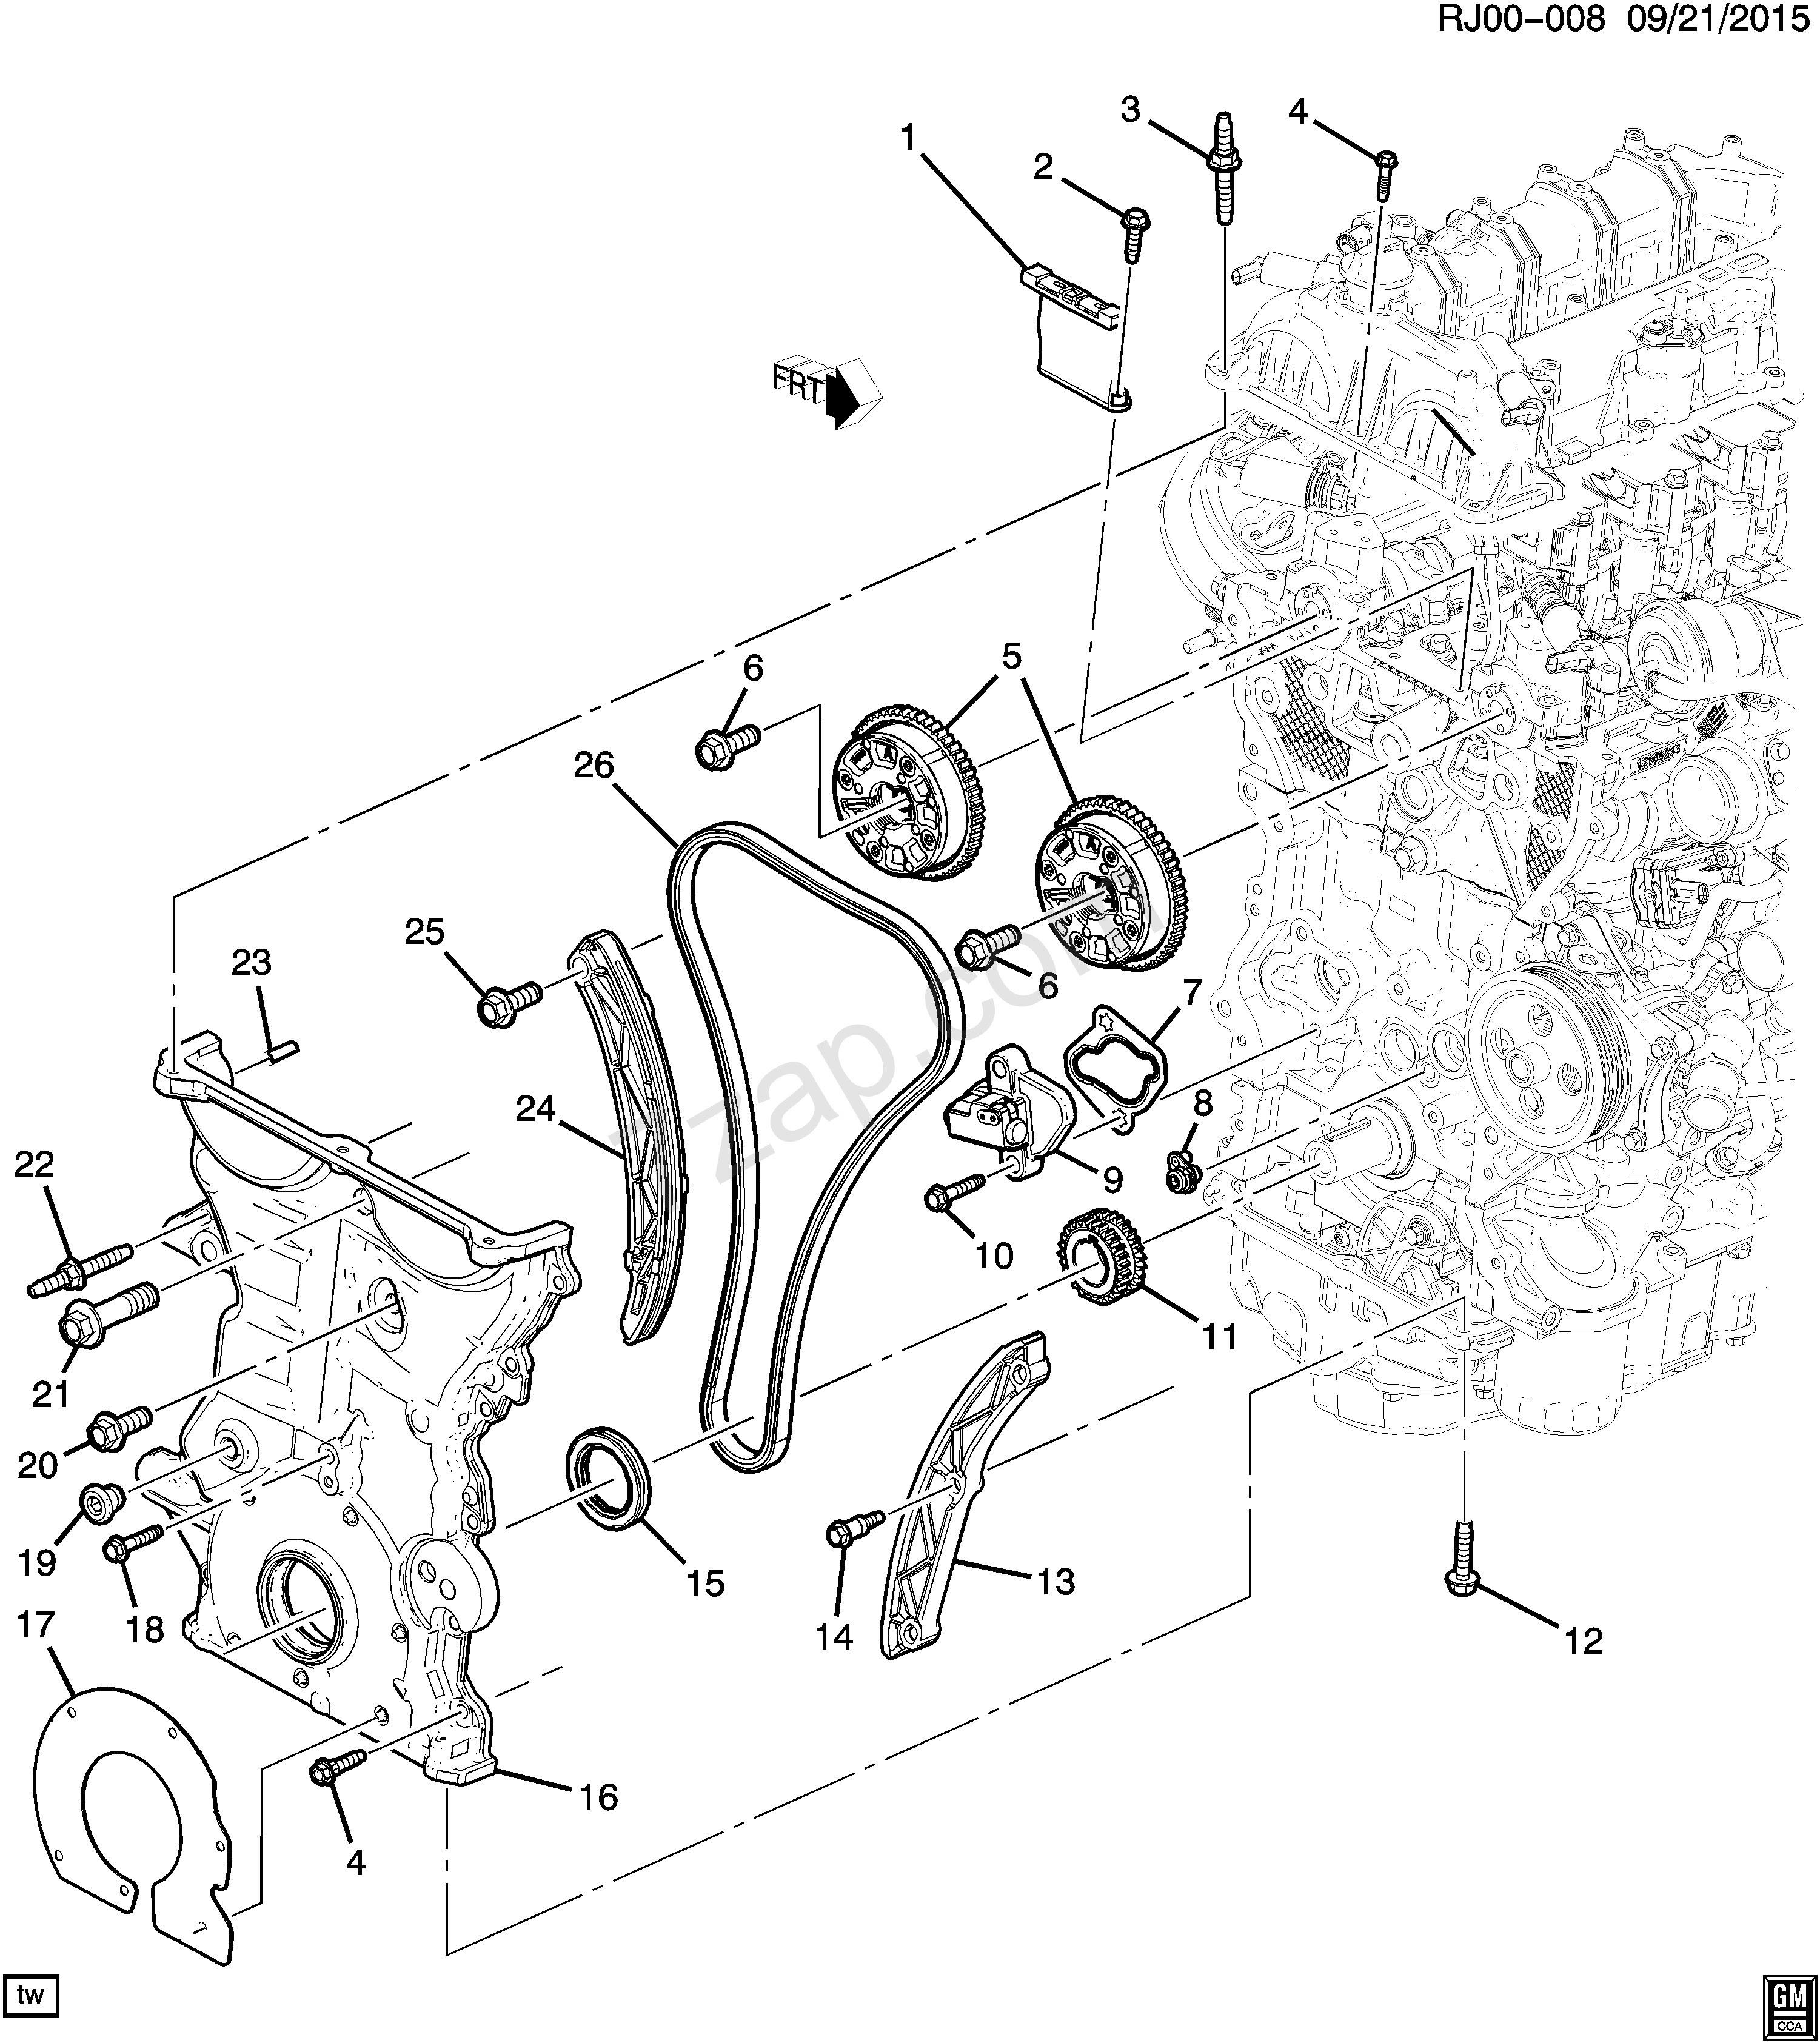 2013 Chevy Malibu Engine Diagram Wiring Diagram Note Make A Note Make A Cfcarsnoleggio It